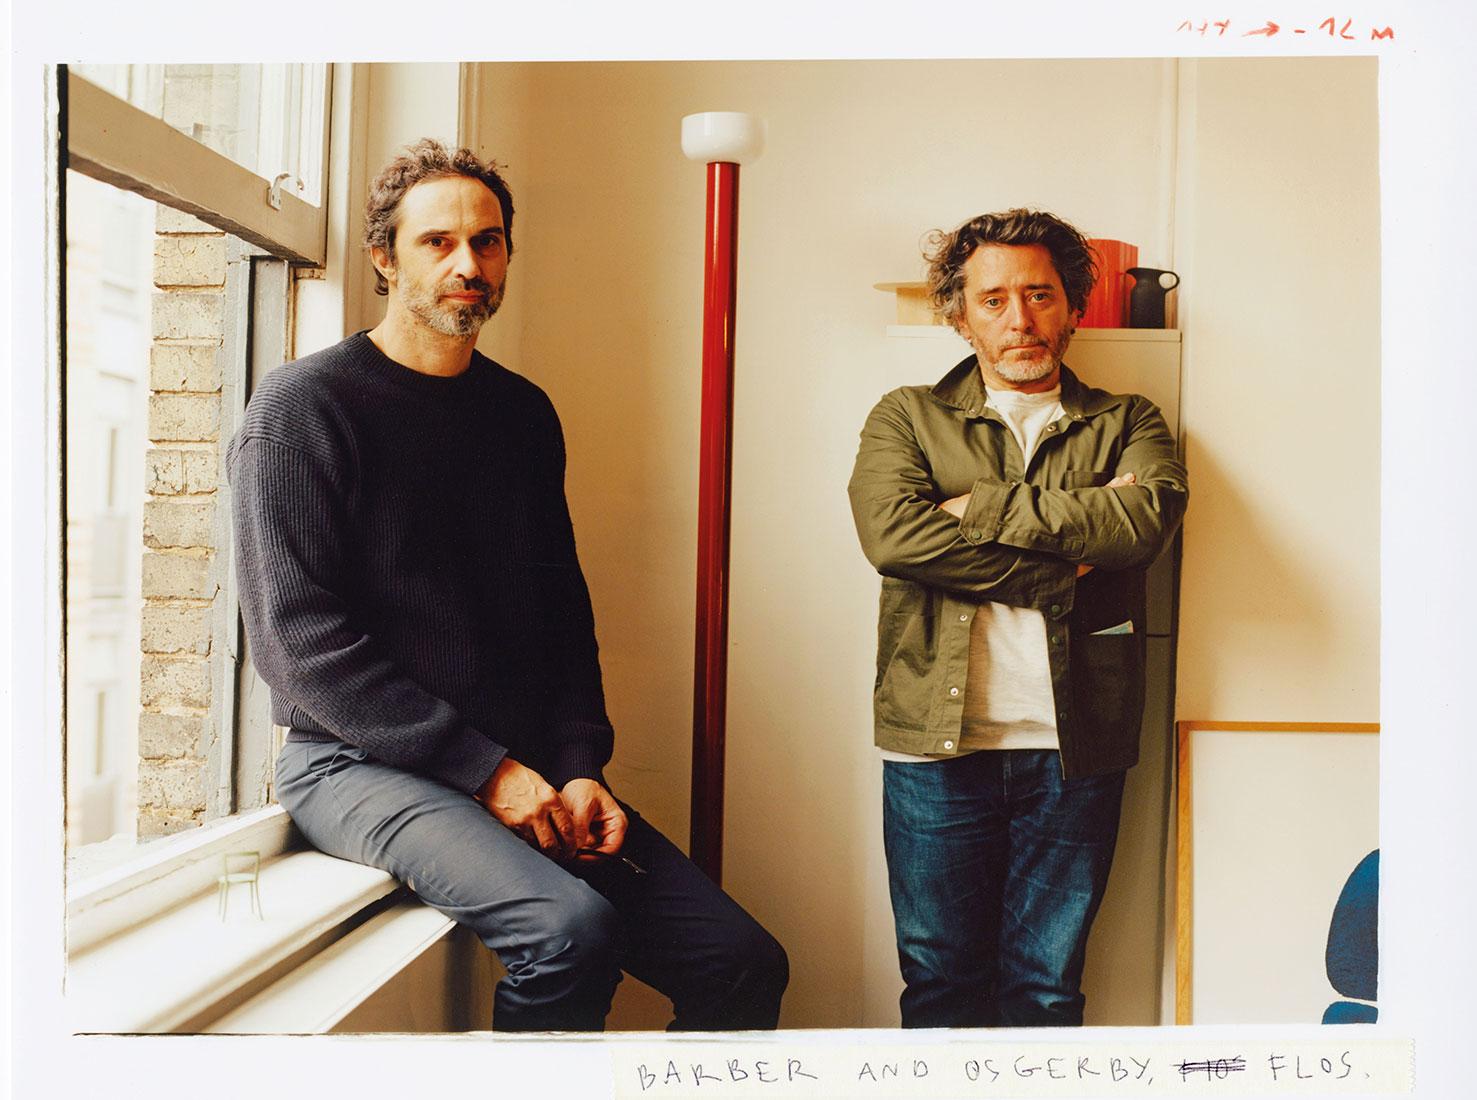 Эдвард Барбер и Джей Осгерби фото